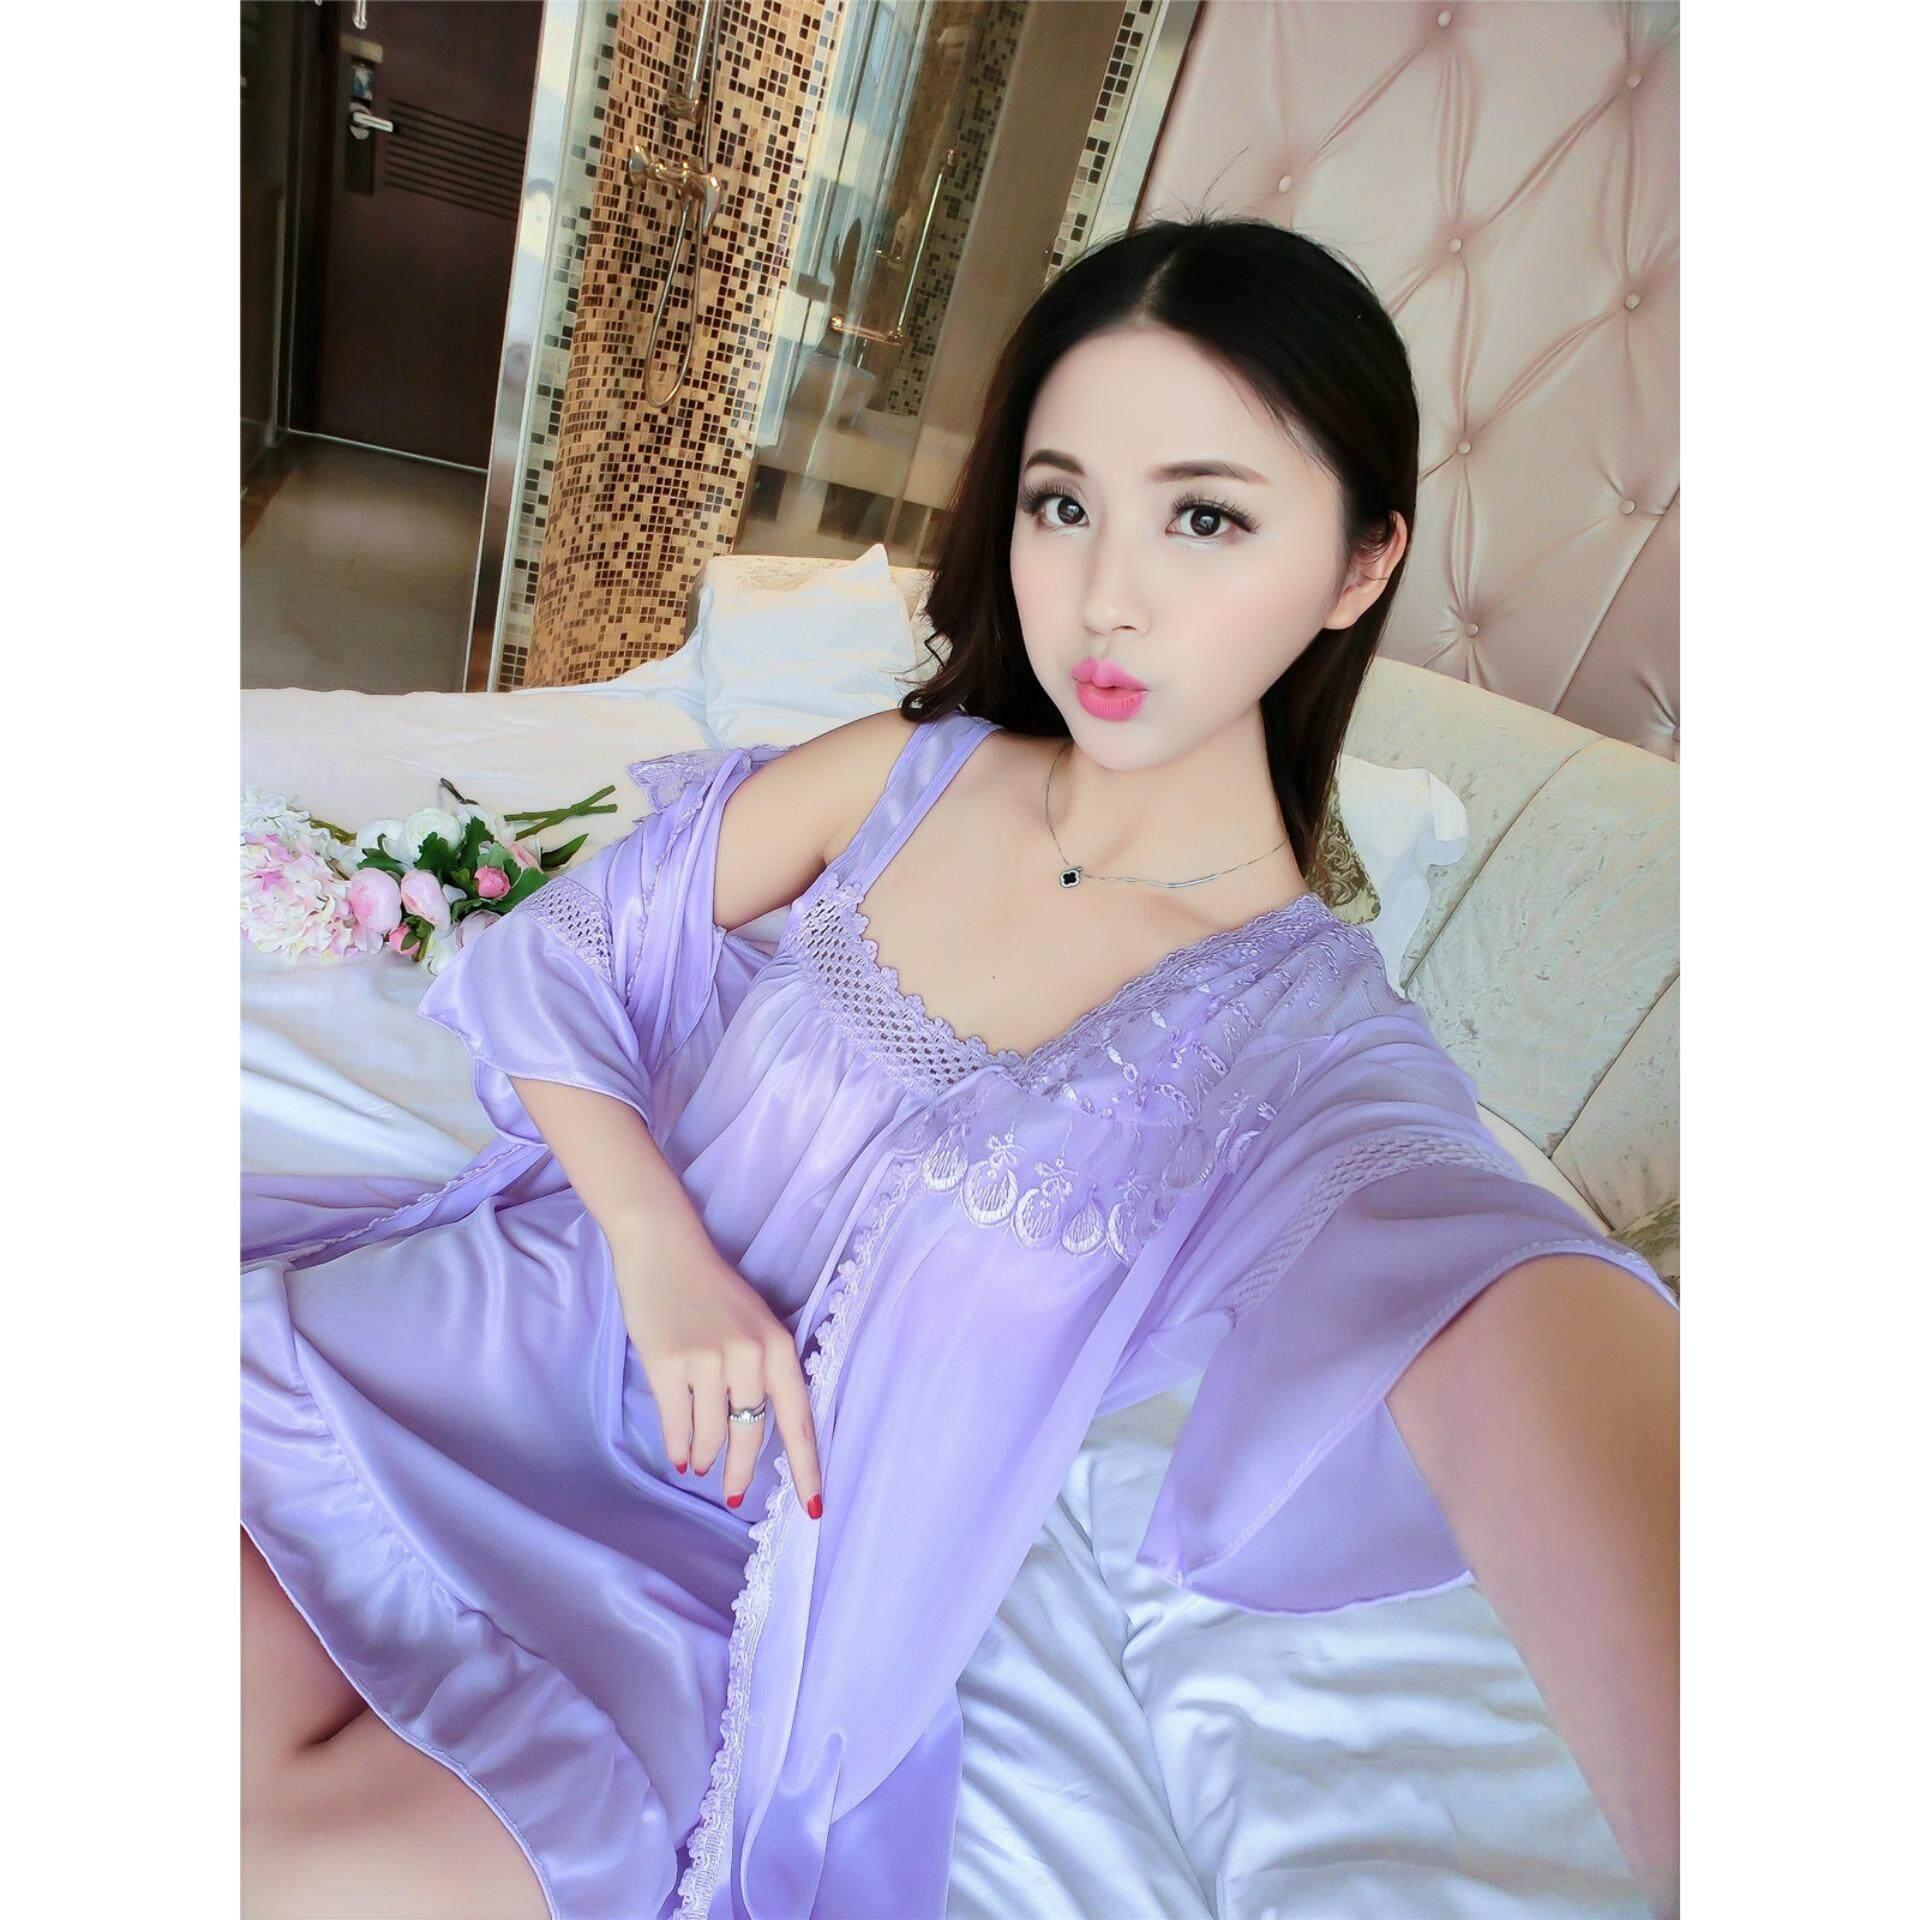 e5758f1c0 Bolster Store Sexy Lingerie Set Sleep Wear Silk Smooth Lace Flower Design  Comfortable Night Wear Pajamas Set of 2 ( Robe + Dress ) (Light Purple)